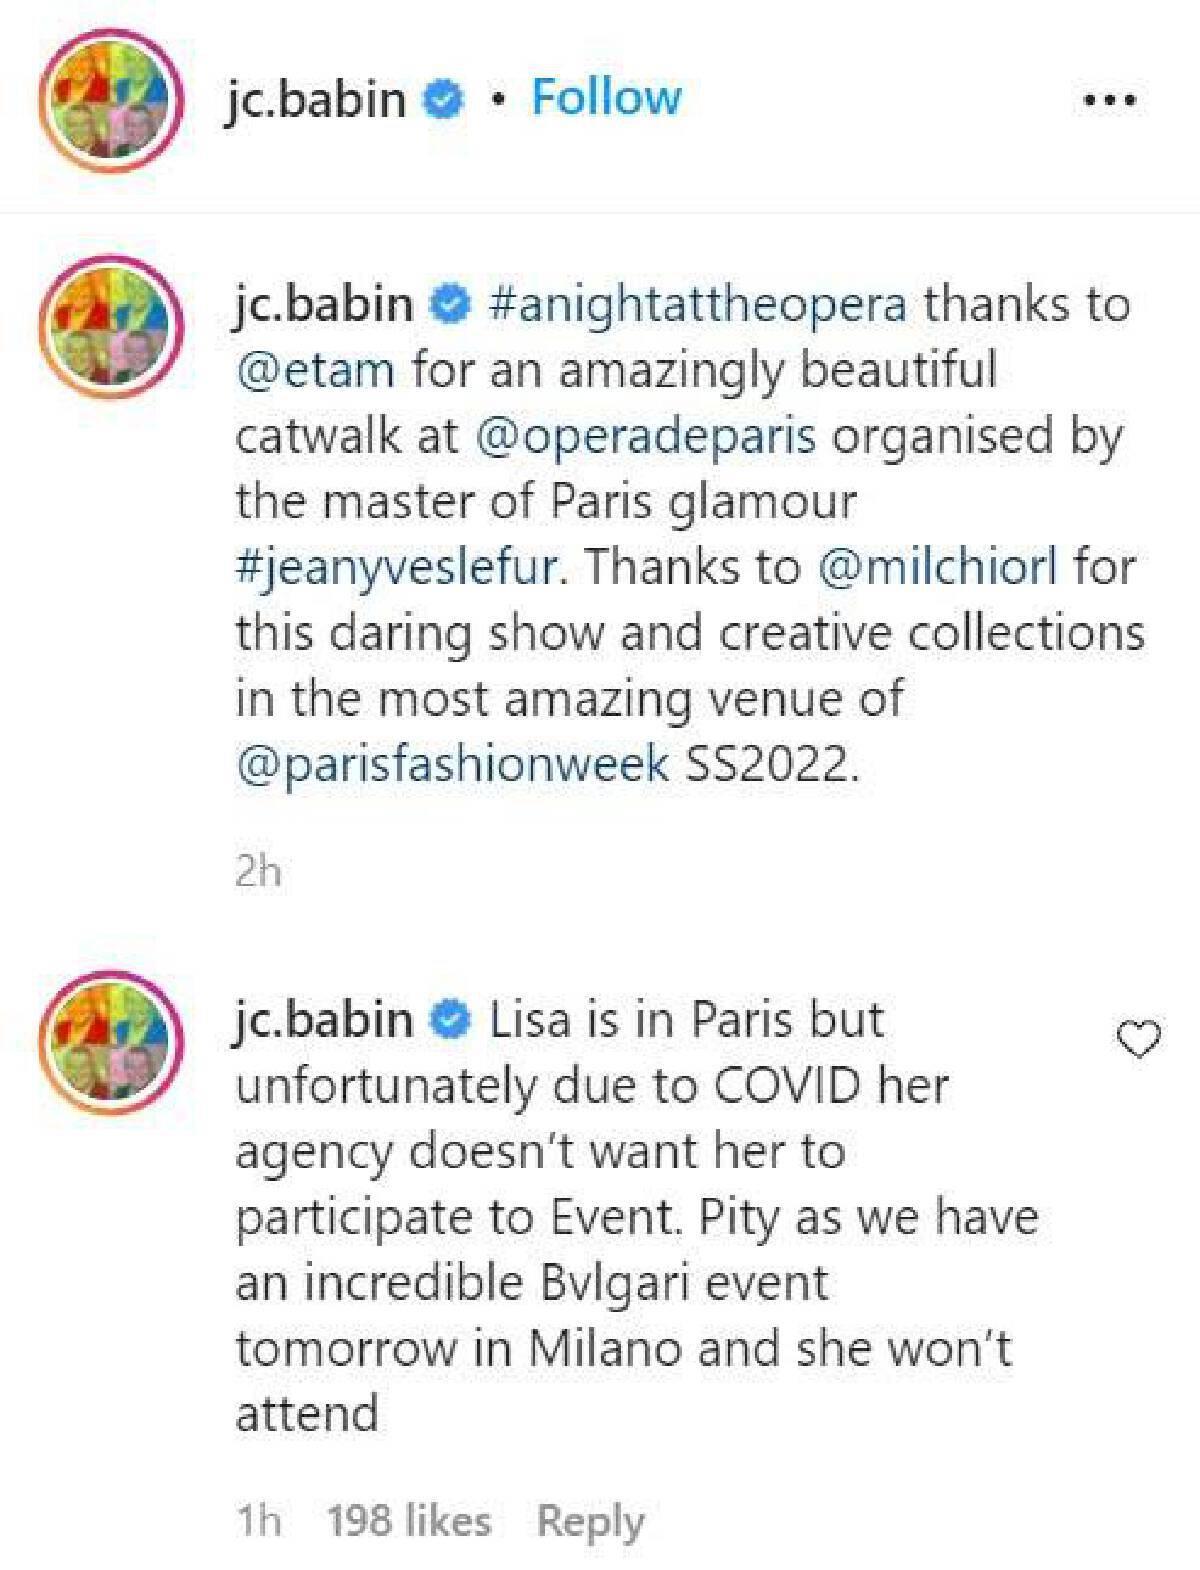 Jean-Christophe Babin ซีอีโอของ BVLGARI ได้โพสต์บนอินสตาแกรมแจงดราม่า YG ห้าม ลิซ่า  BLACKPINK  ร่วมงาน BVLGARI